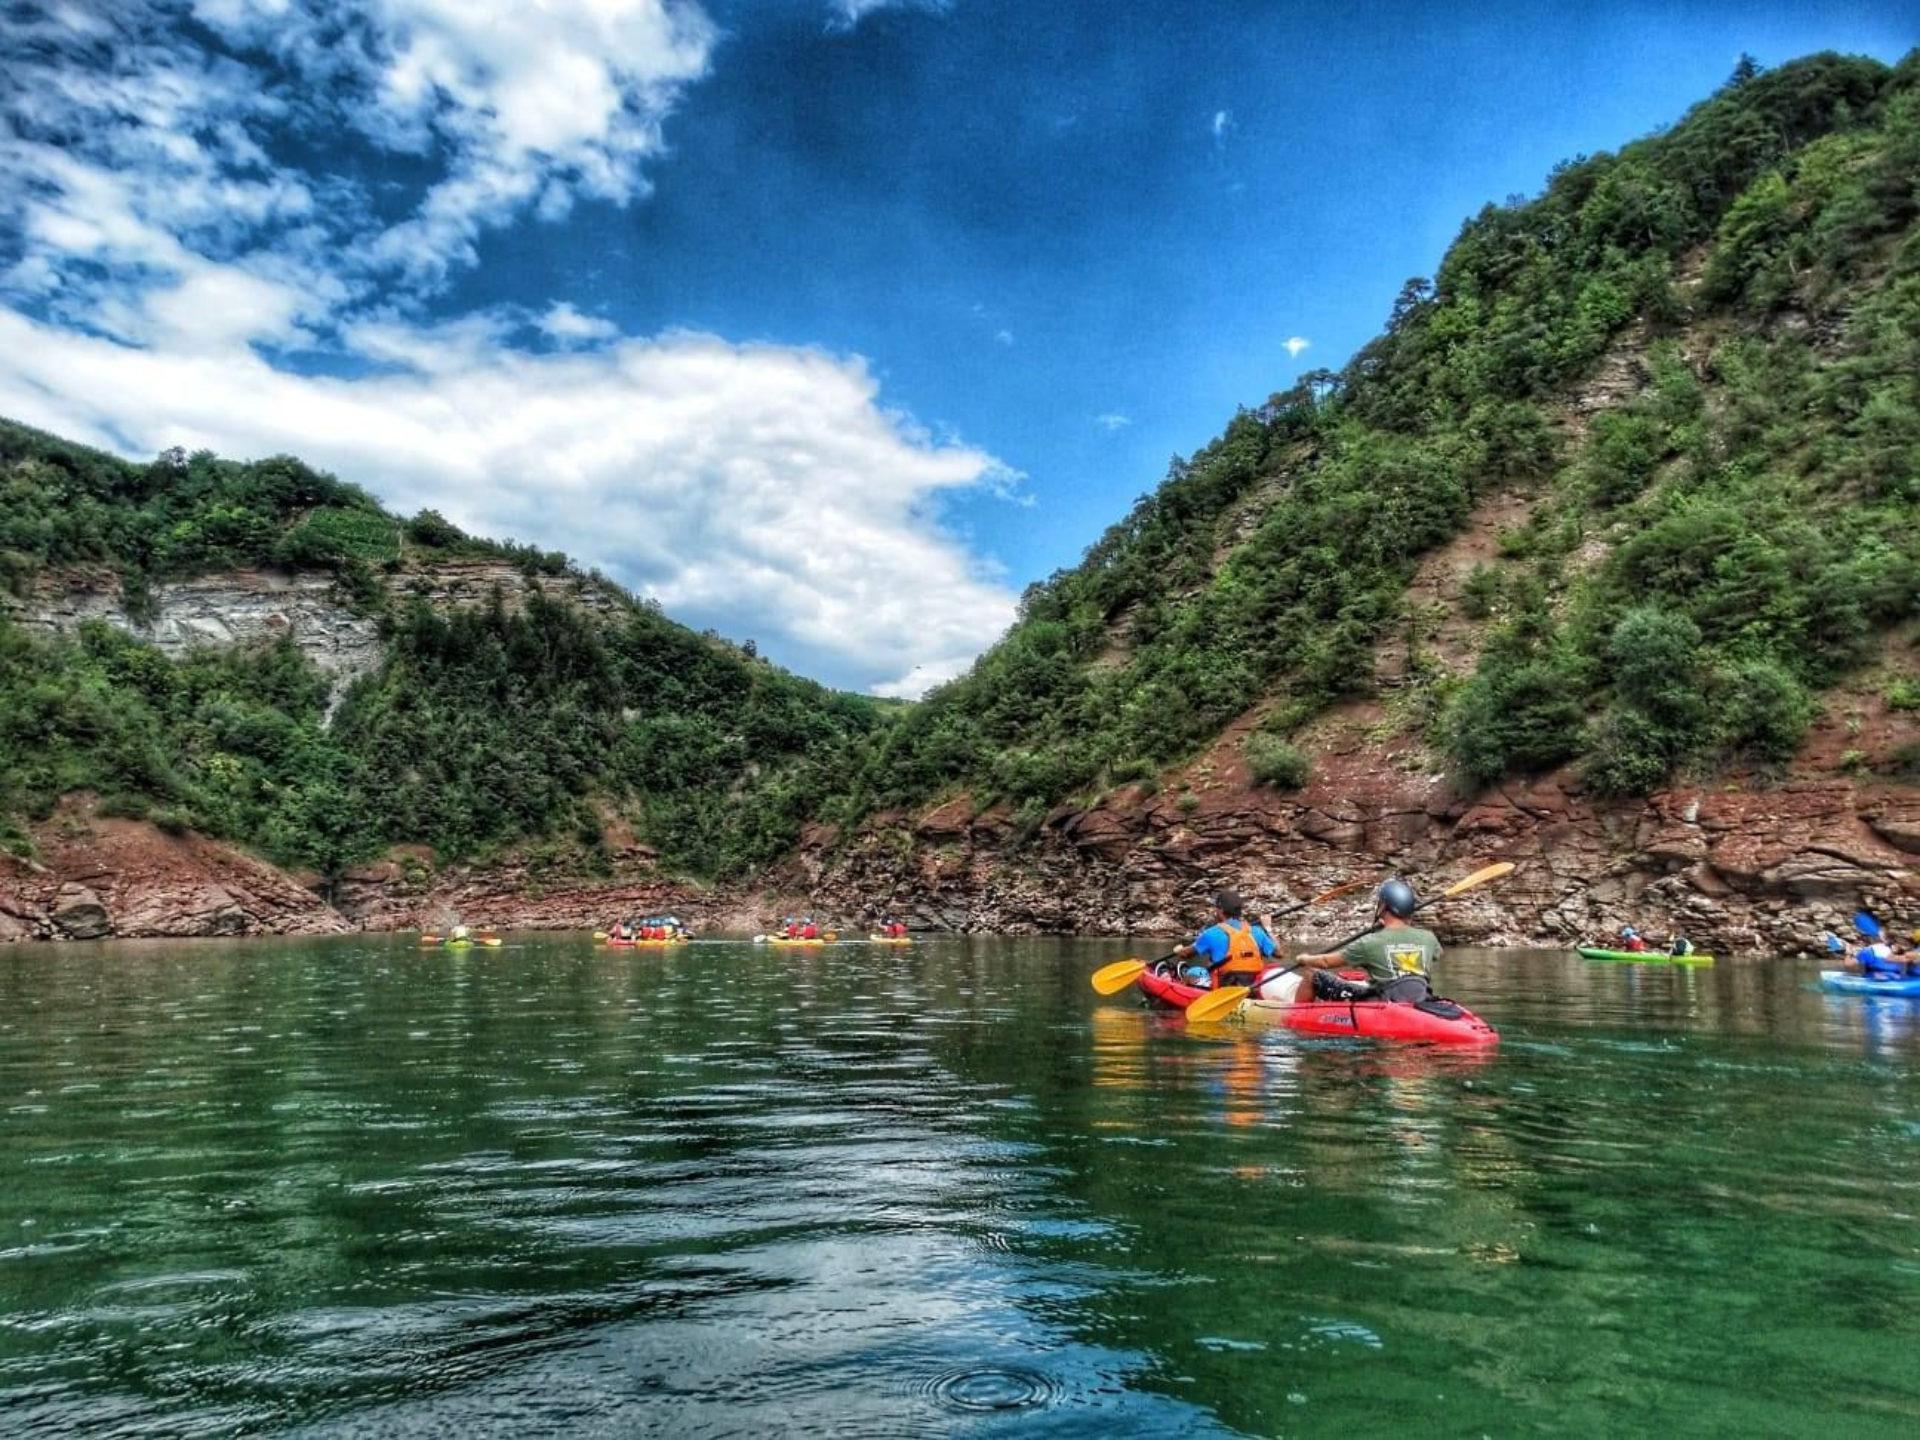 Canoa e kayak Trentino-Alto Adige